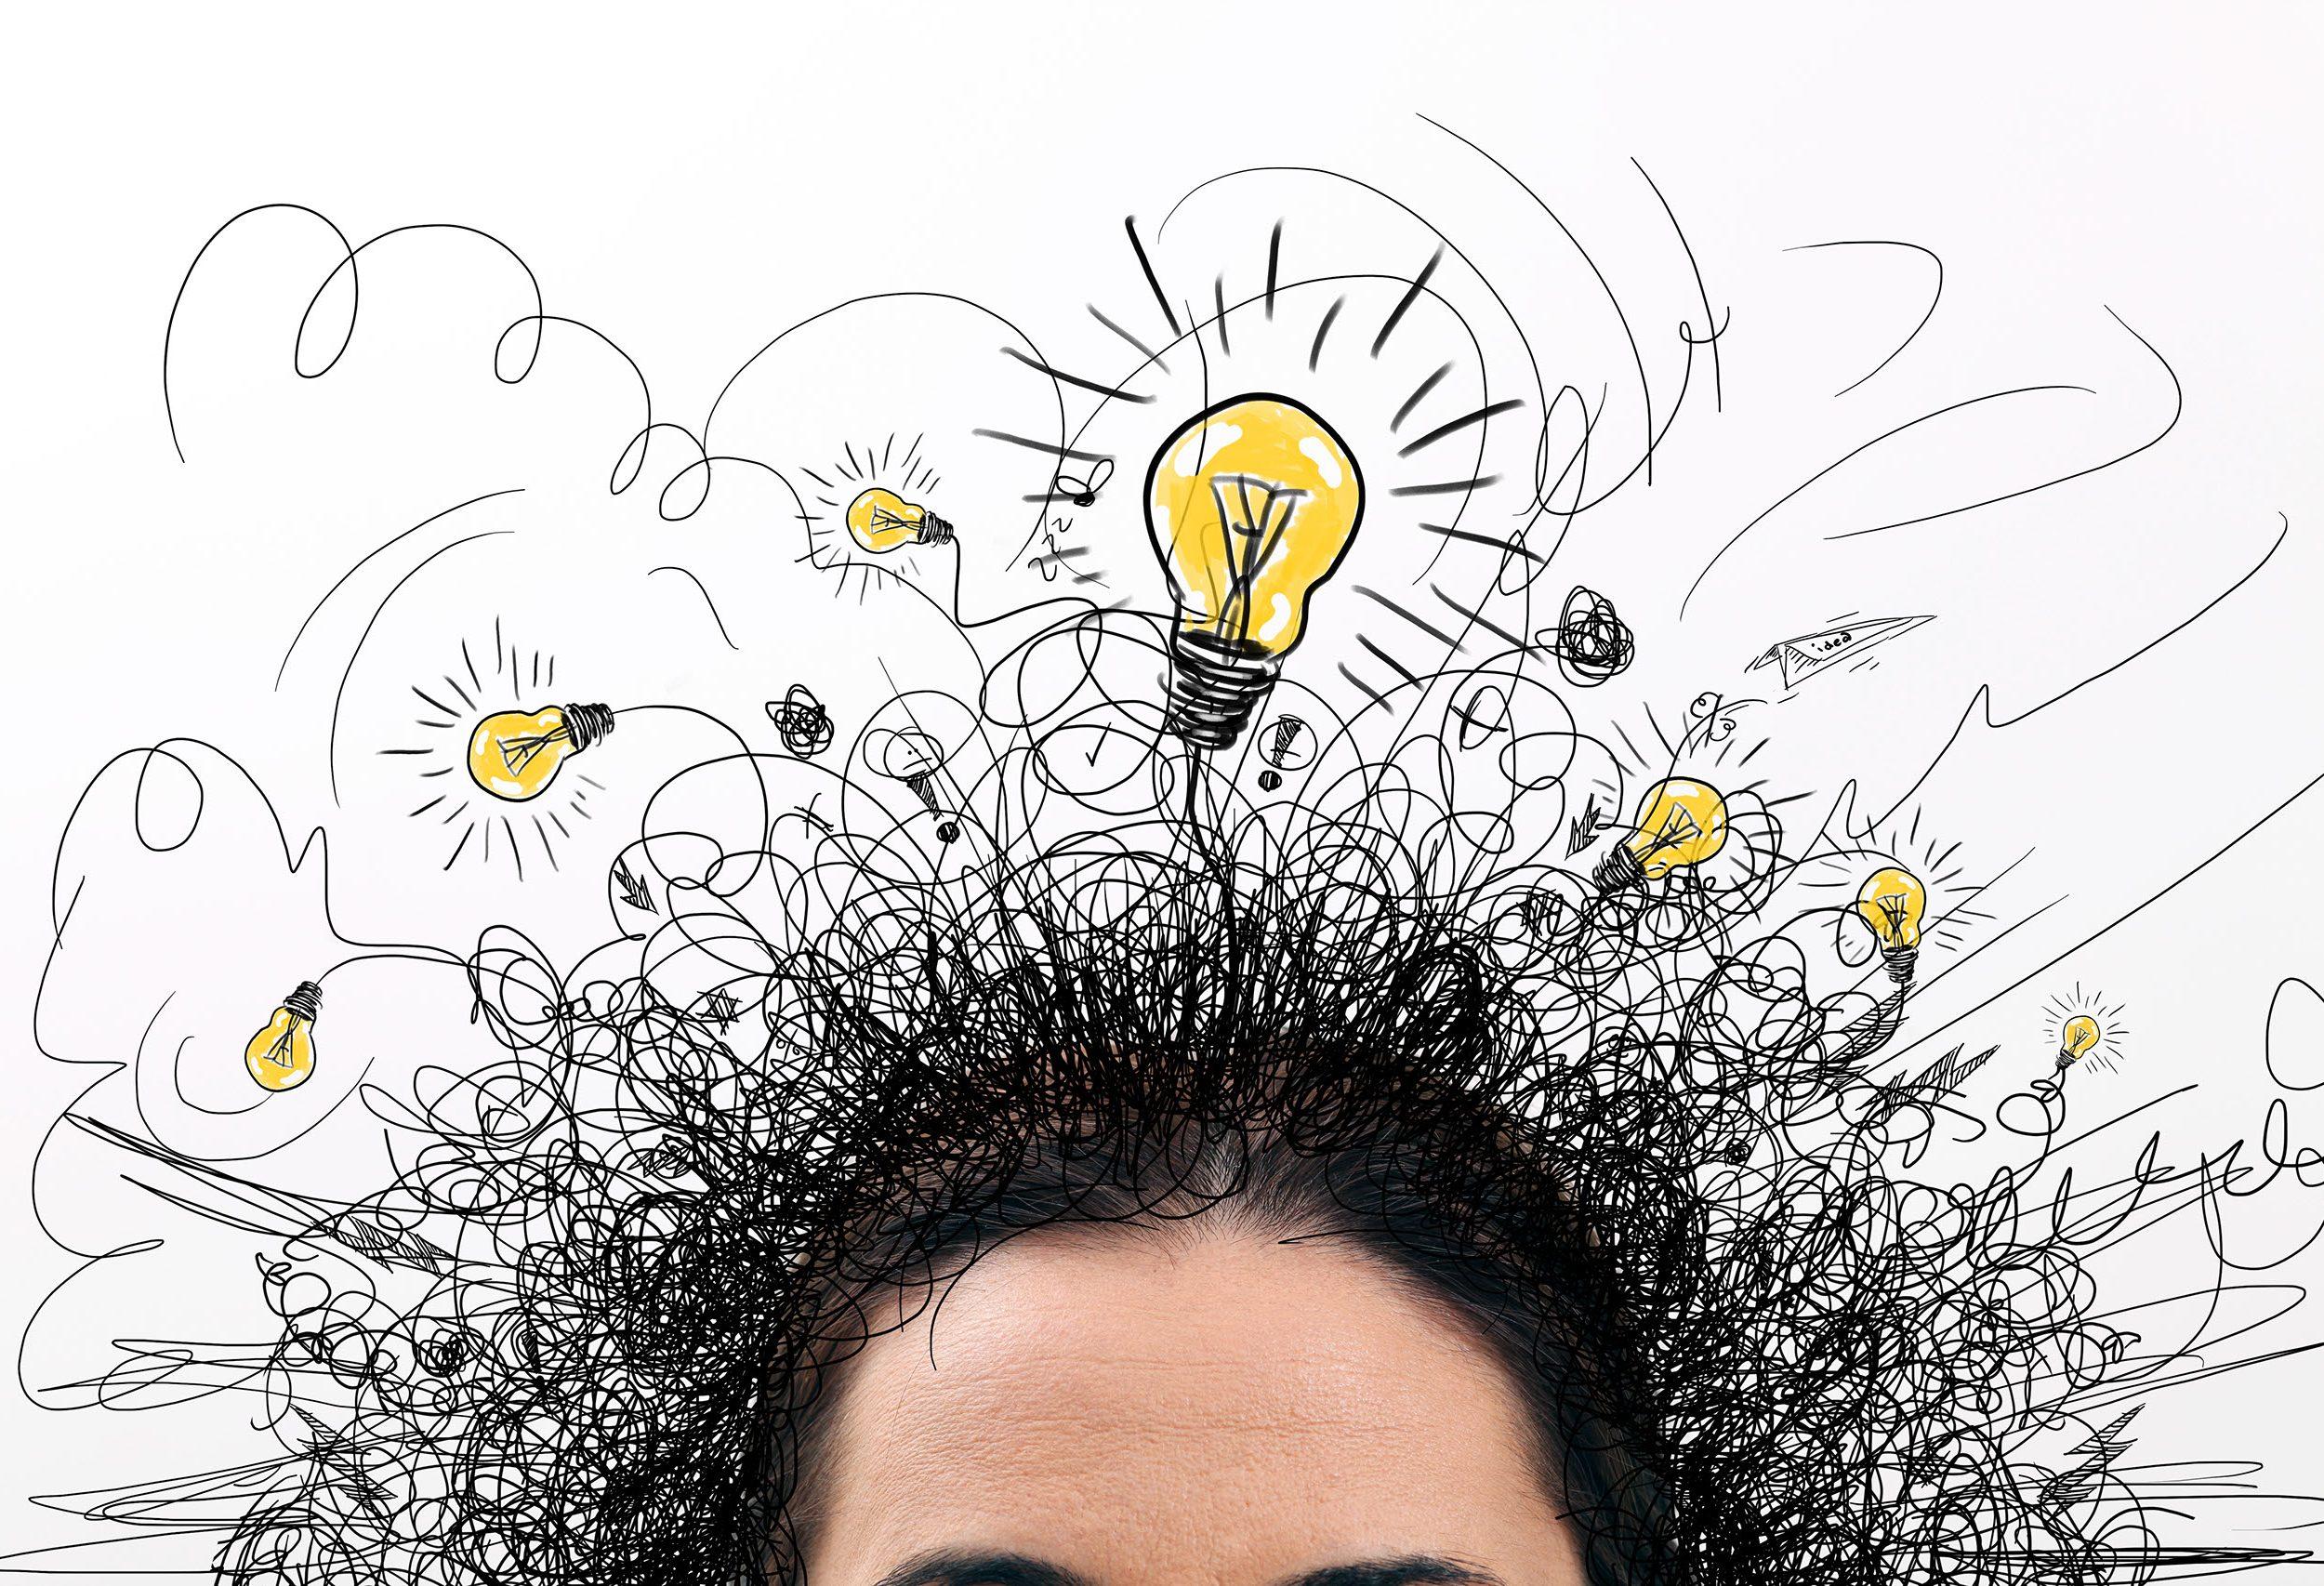 Neuro-marketing tools